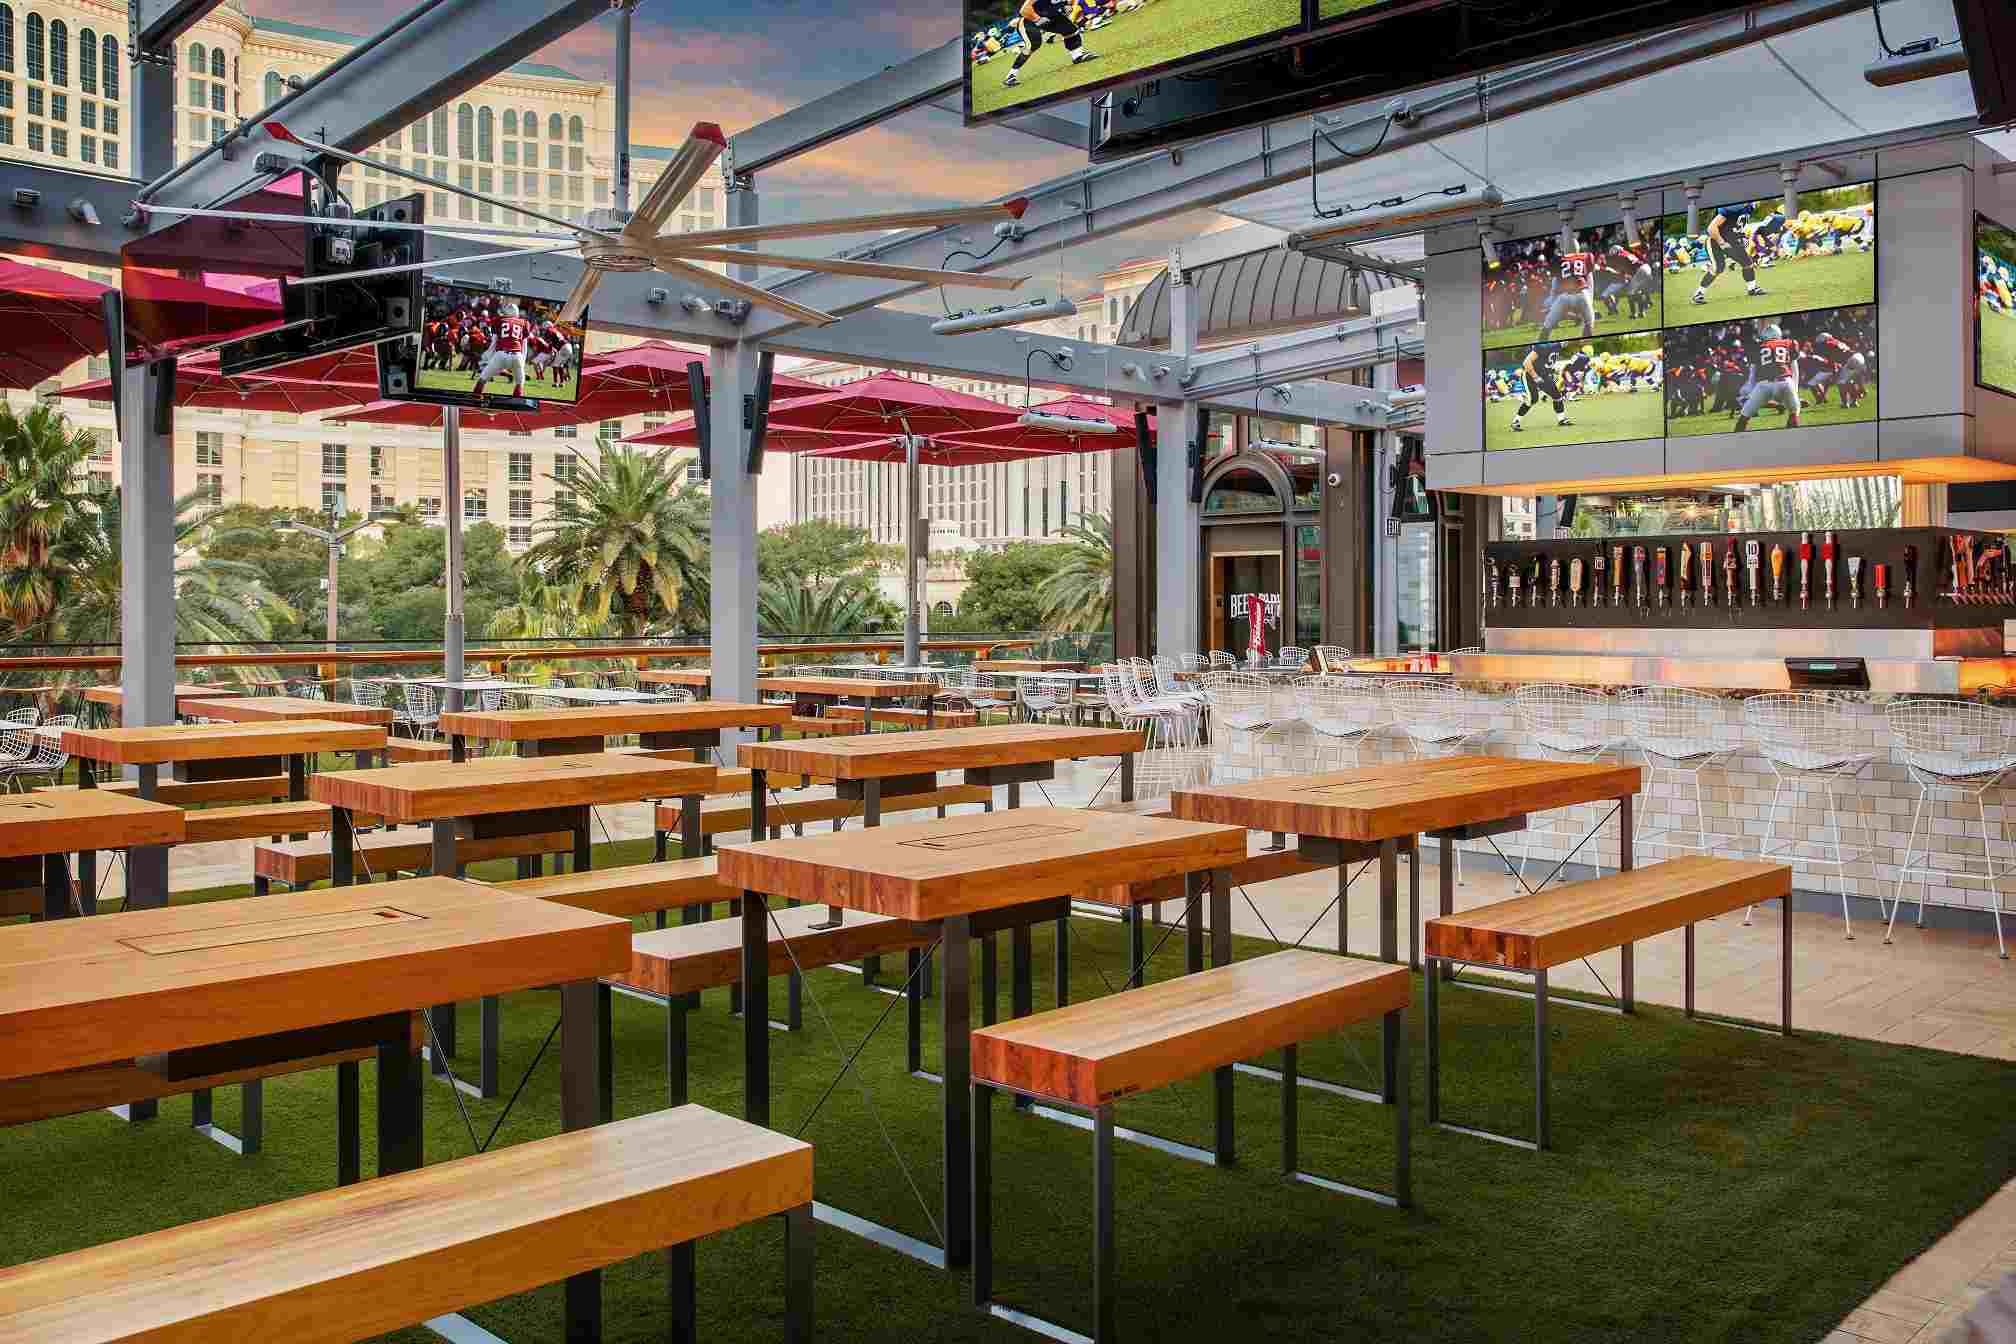 Beer Park at Paris Las Vegas